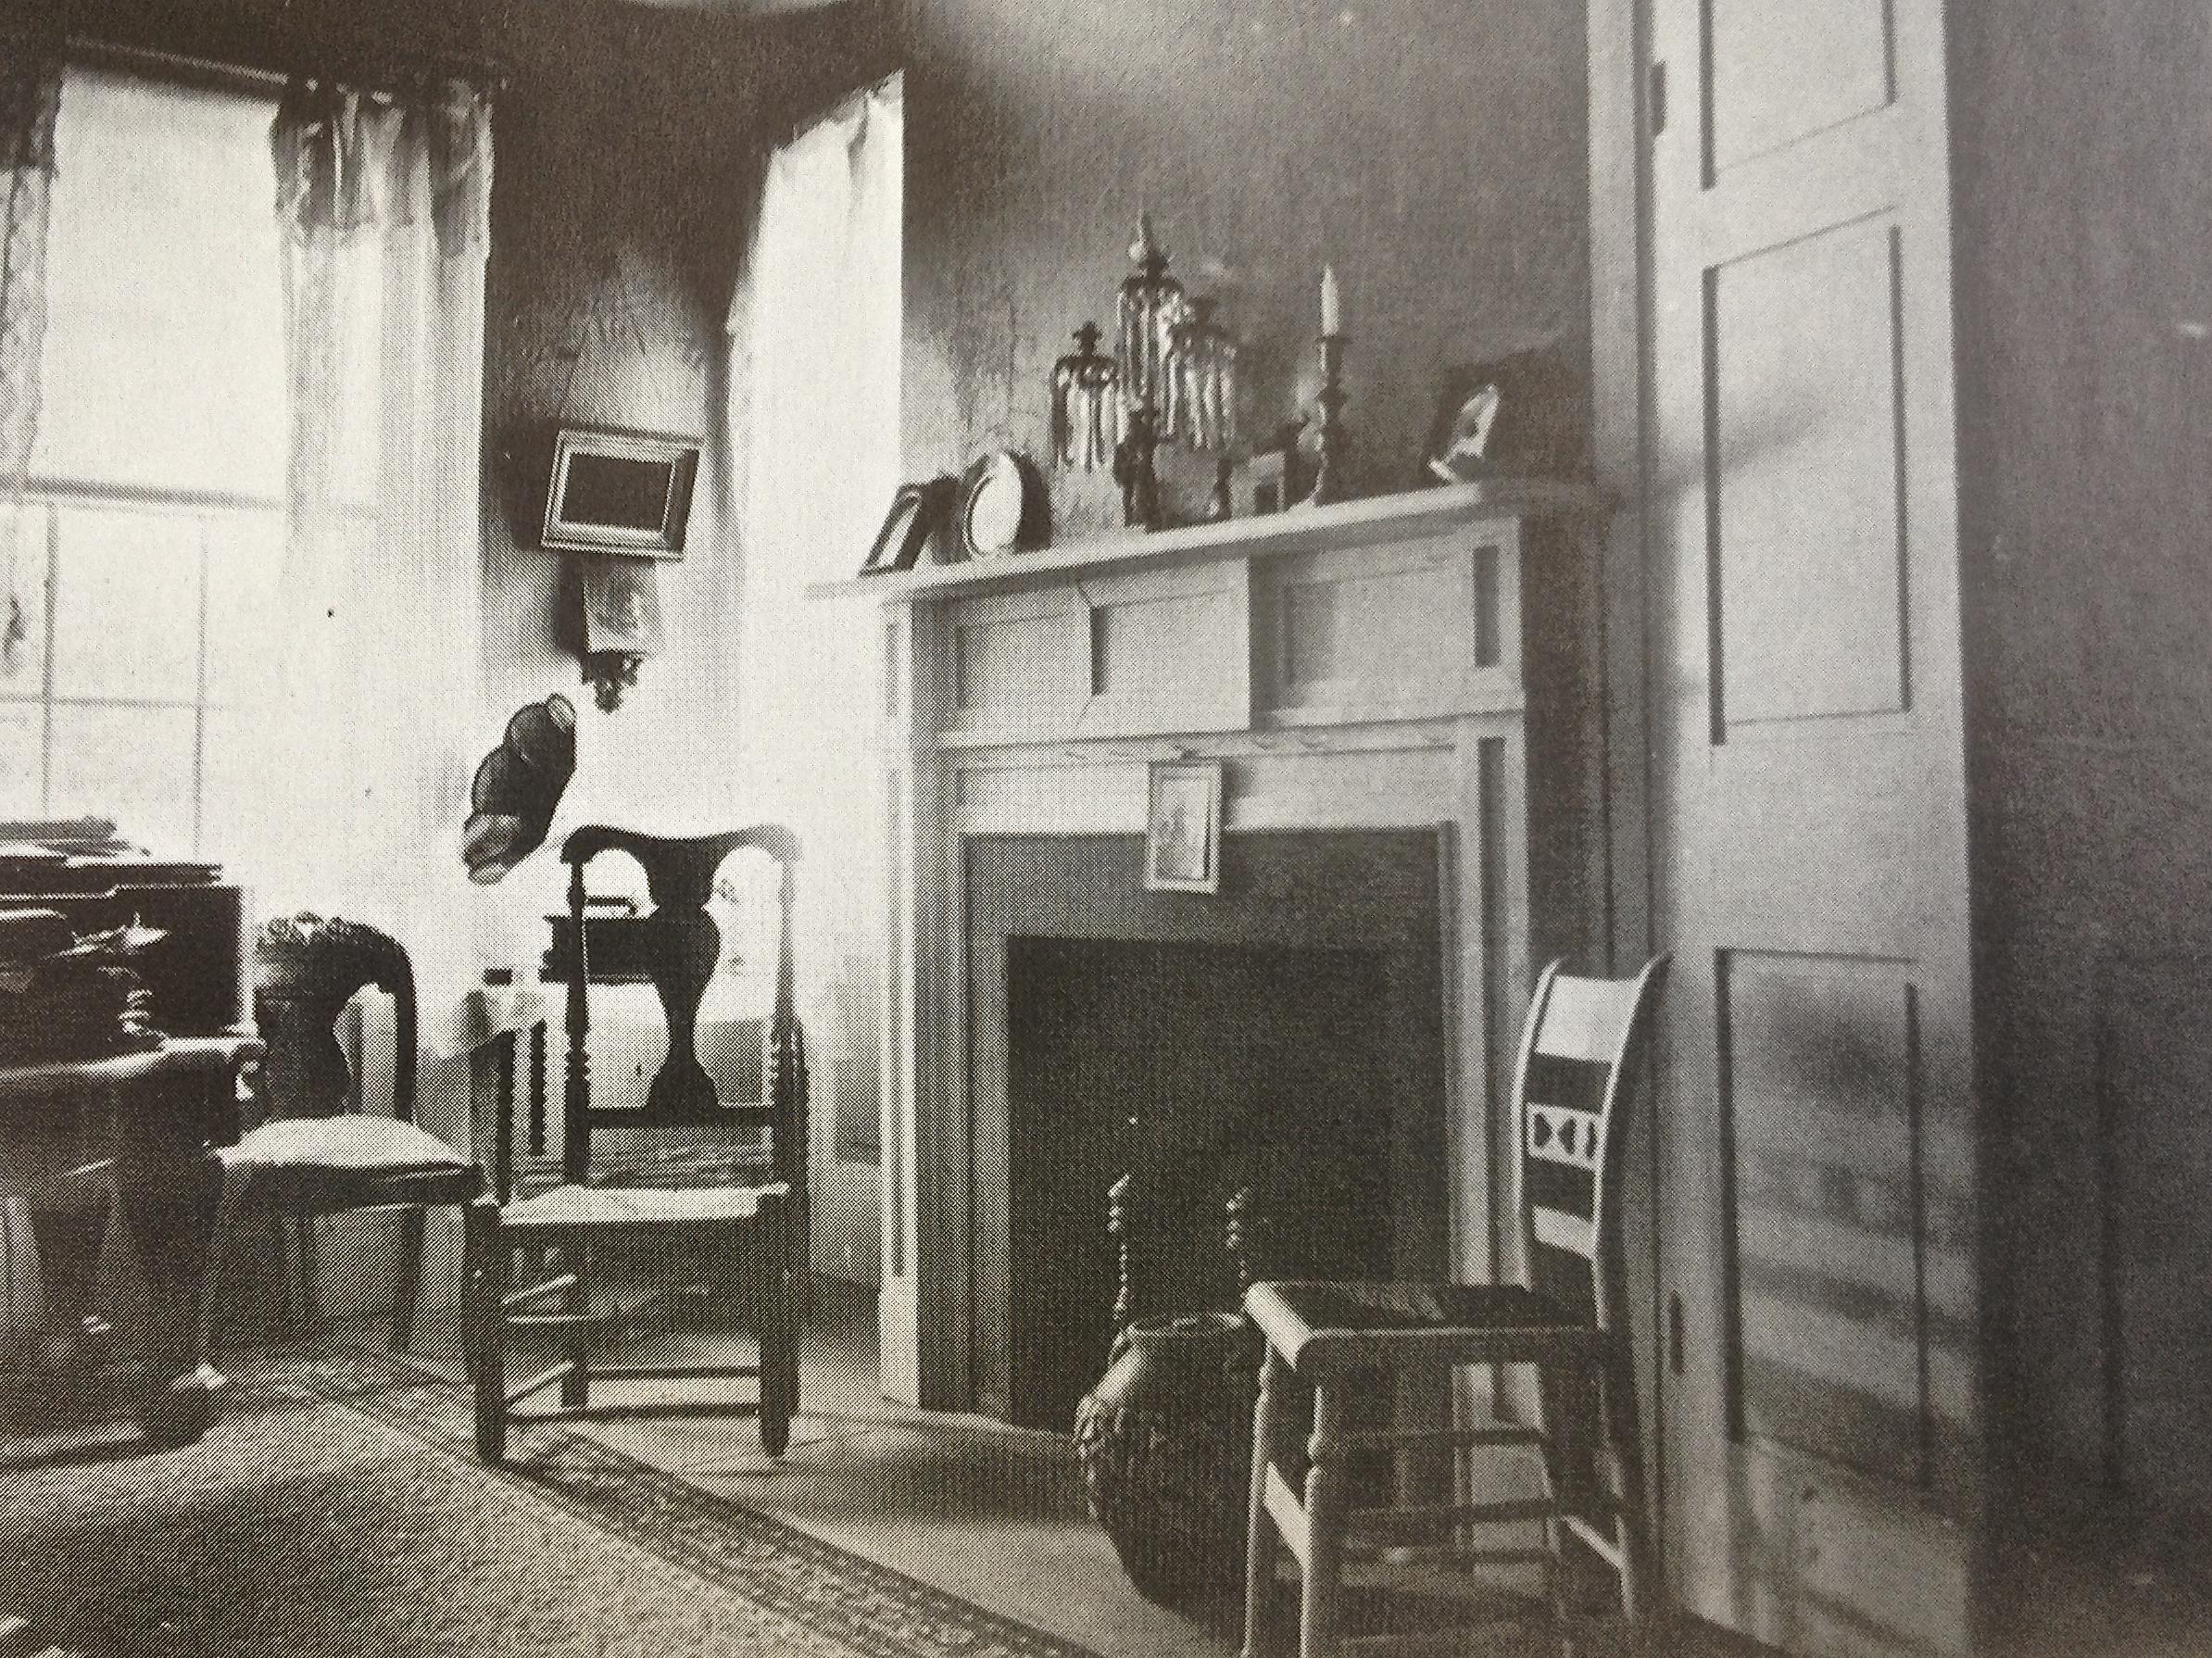 11 Historic Family Room Photo.jpg